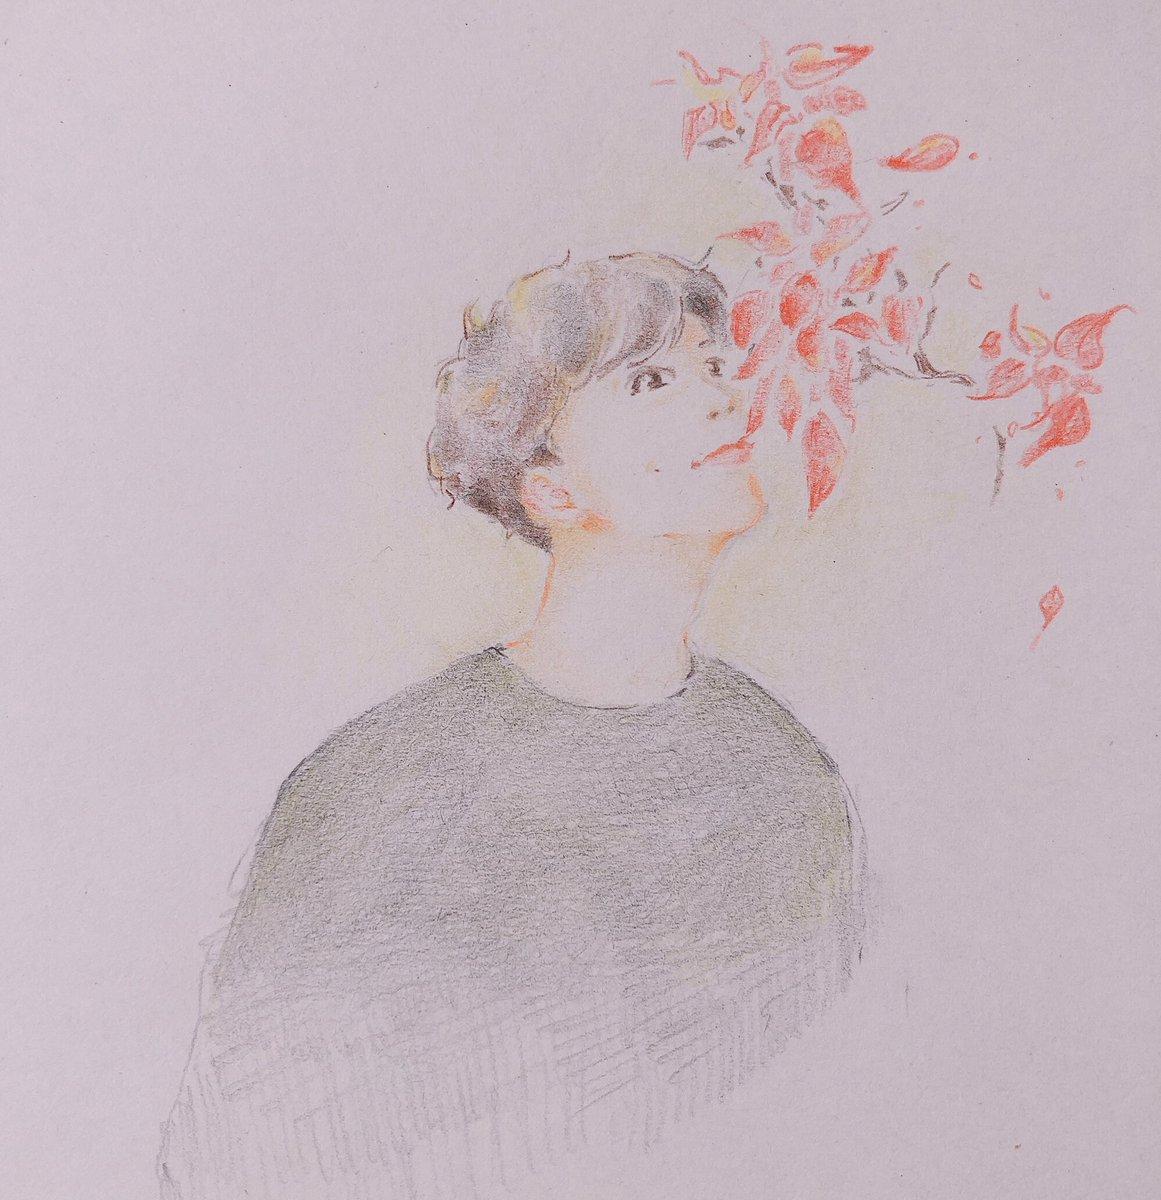 #warwanarat #yinwarfanart 色鉛筆で描いてみました✏️日本から応援してます✨